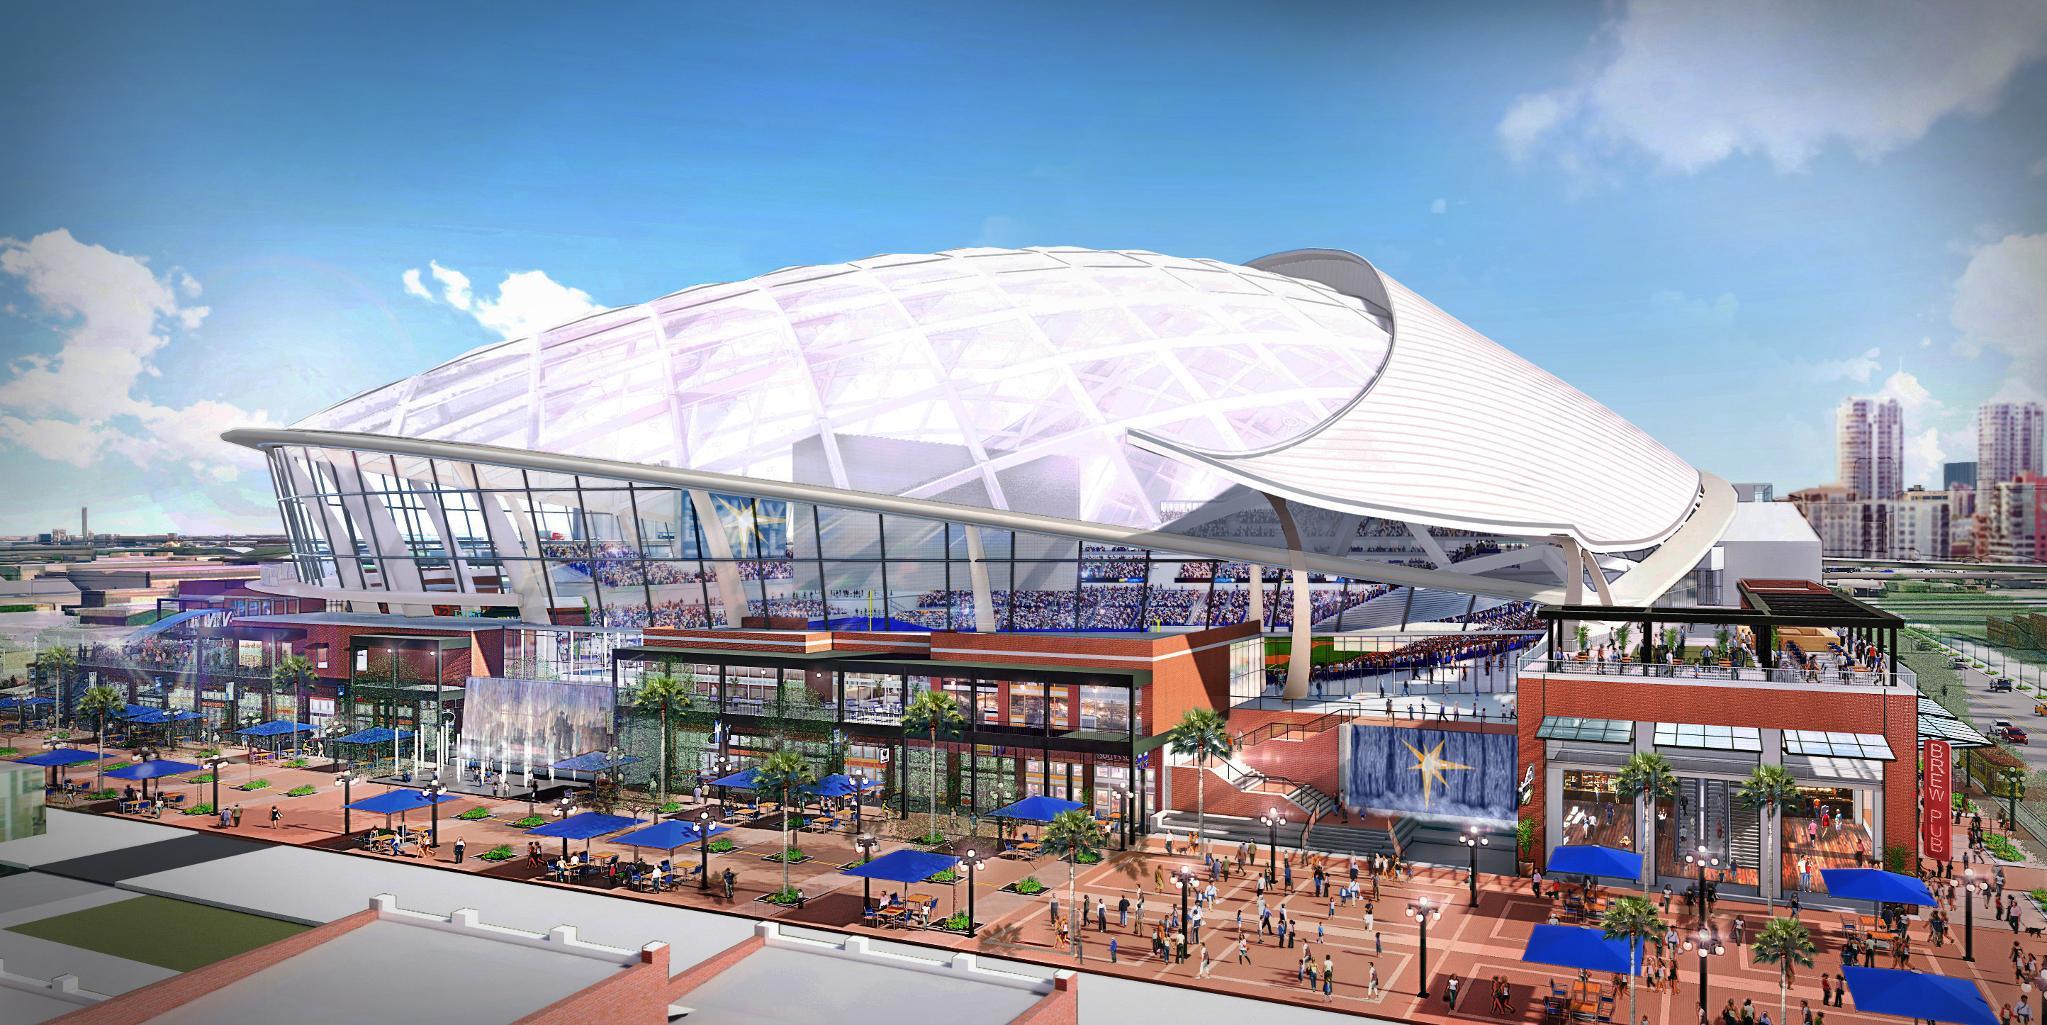 Tampa Bay's future ballpark. https://t.co/d1hyjfsnxK    #RaysUp https://t.co/jPDlNDD6cs